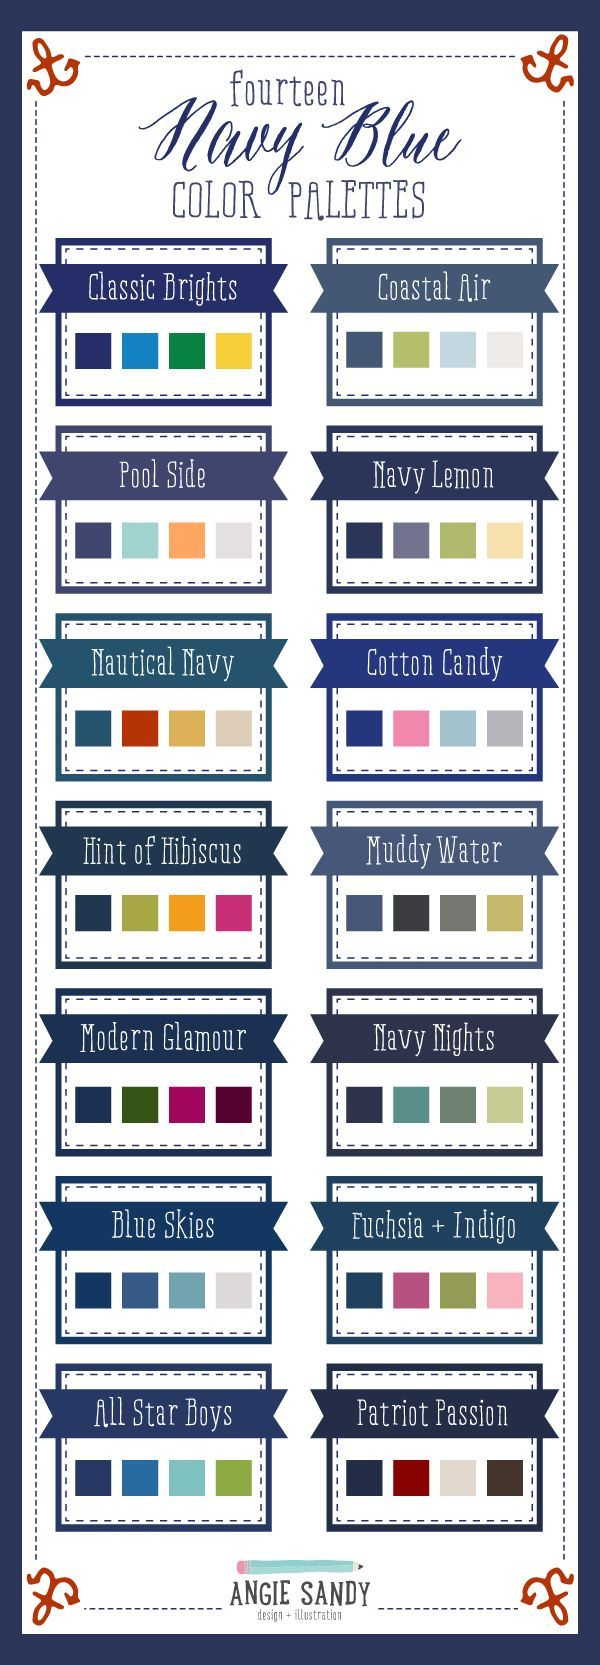 14 Navy Blue Color Palettes   Angie Sandy Design + Illustration #colorpalettes #colorcrush #navy